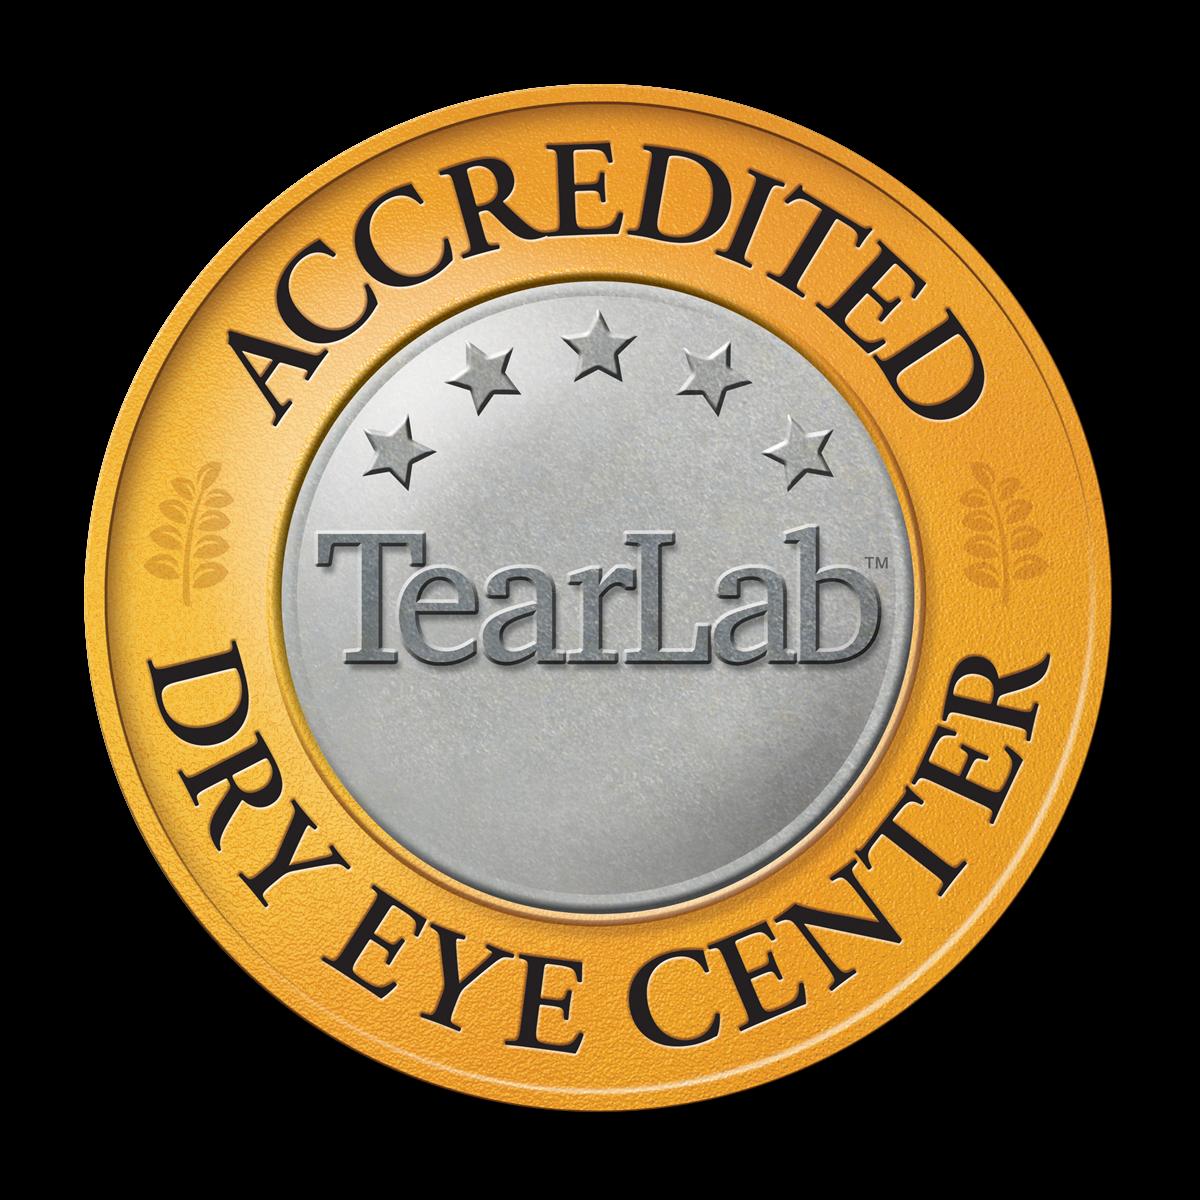 Accredited Dry Eye Center logo